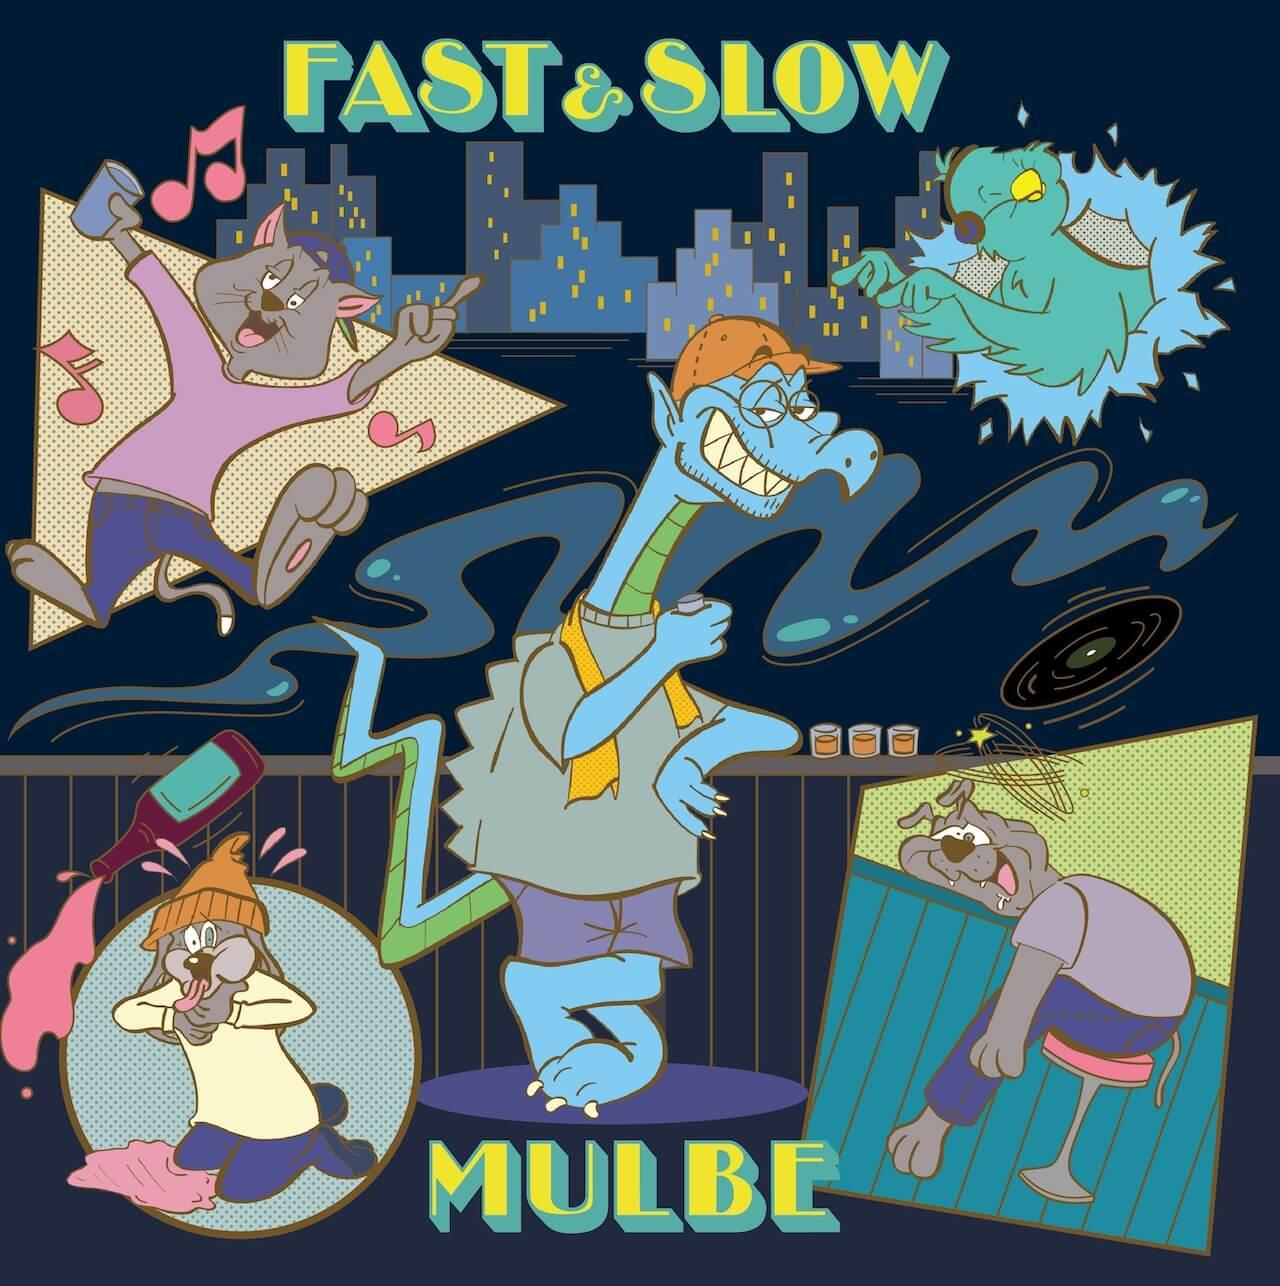 MULBEの1stフルアルバム『FAST&SLOW』のVINYL LISTENING SHOWが本日開催 music201021-mulbe-2